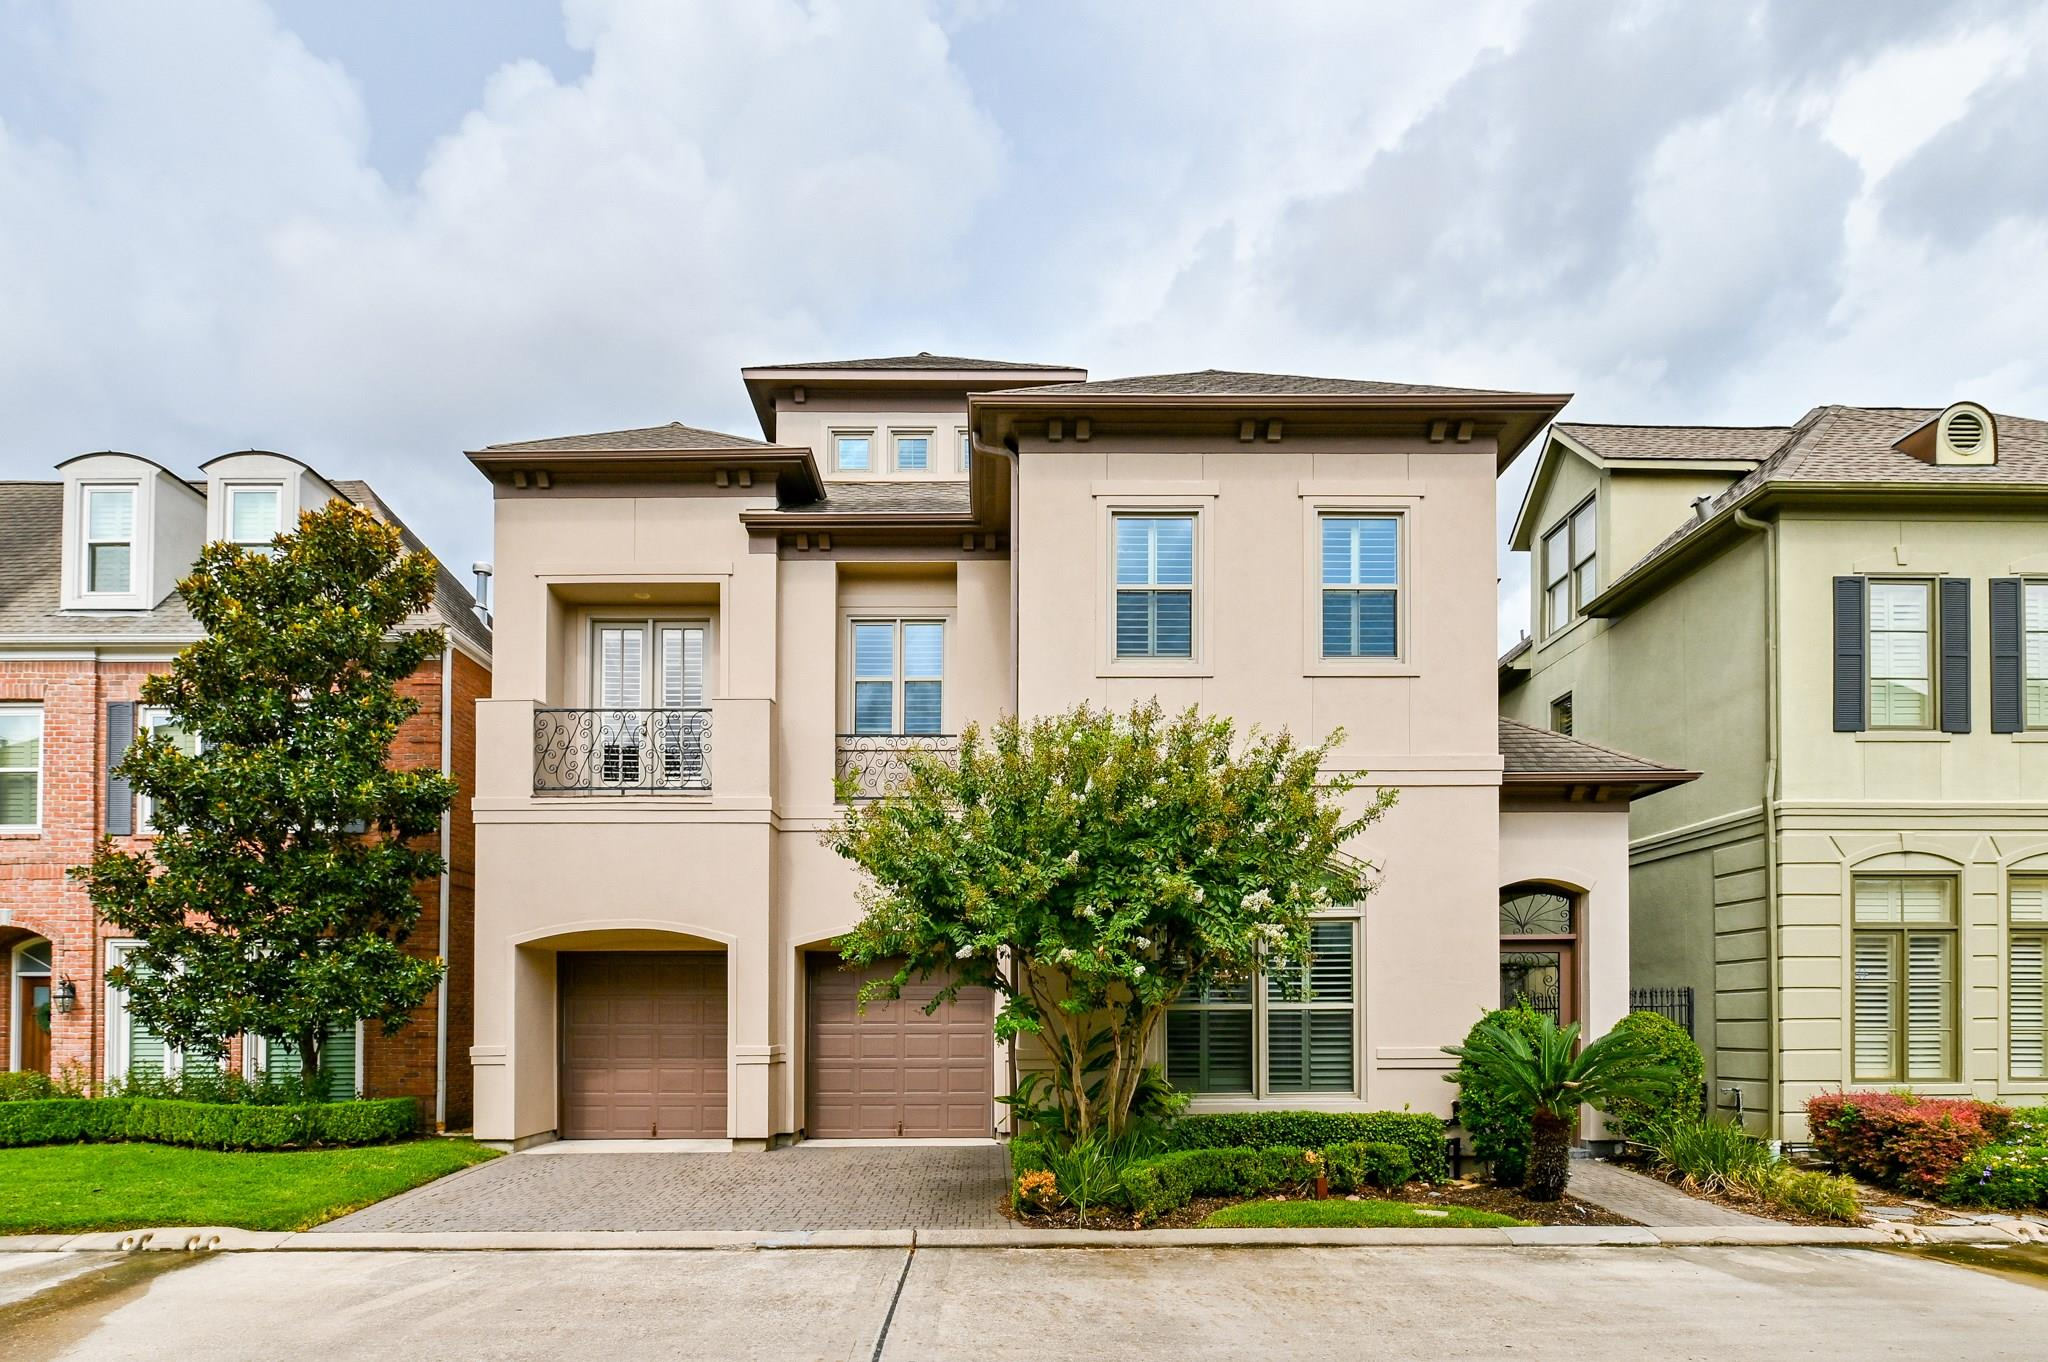 6342 E Mystic Meadow Property Photo - Houston, TX real estate listing